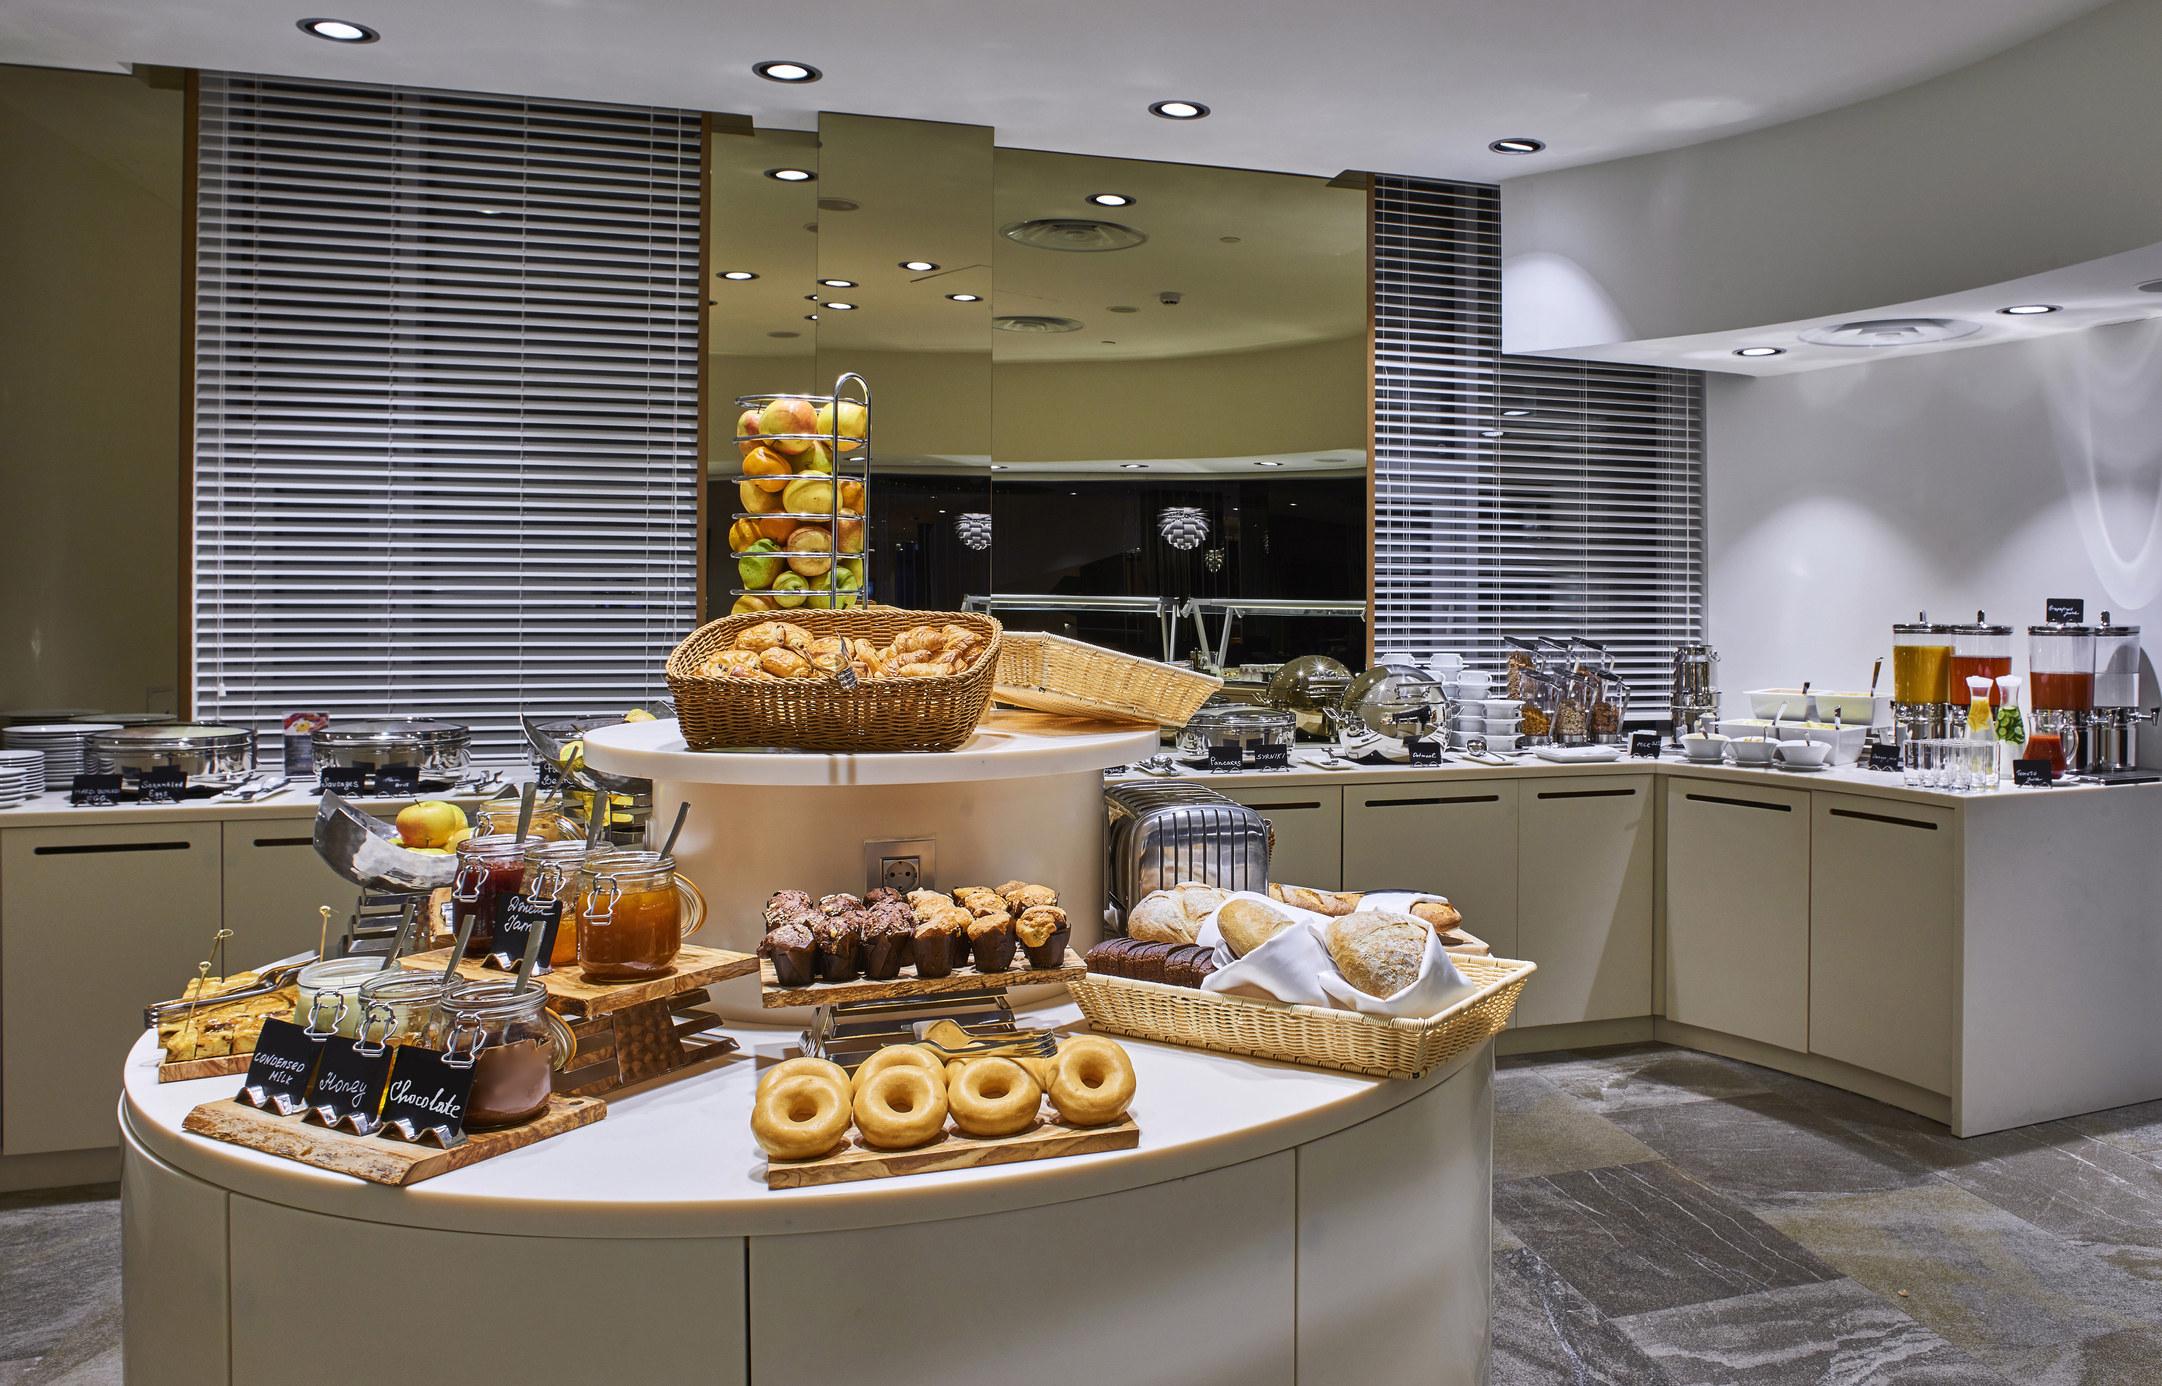 A continental breakfast bar at a hotel